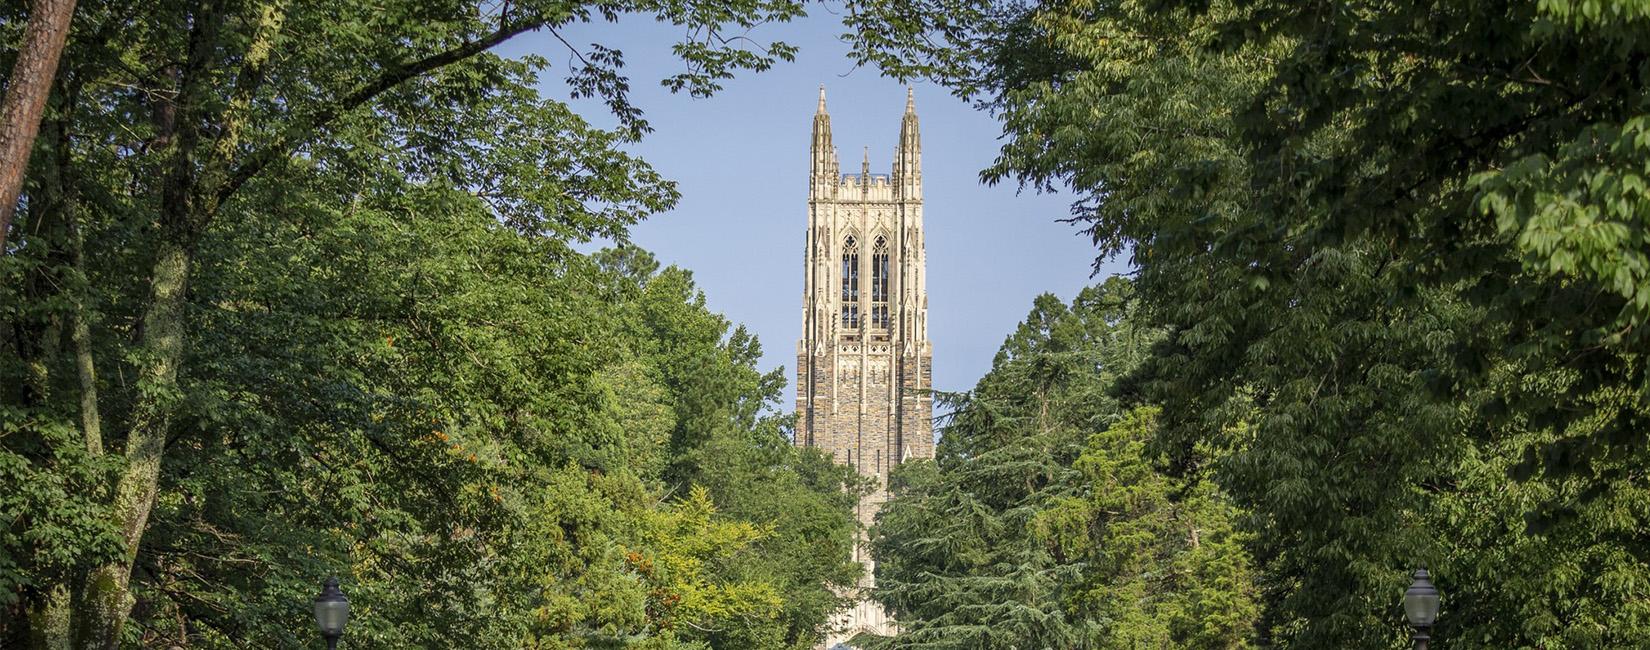 Photo of Duke University tower with trees.